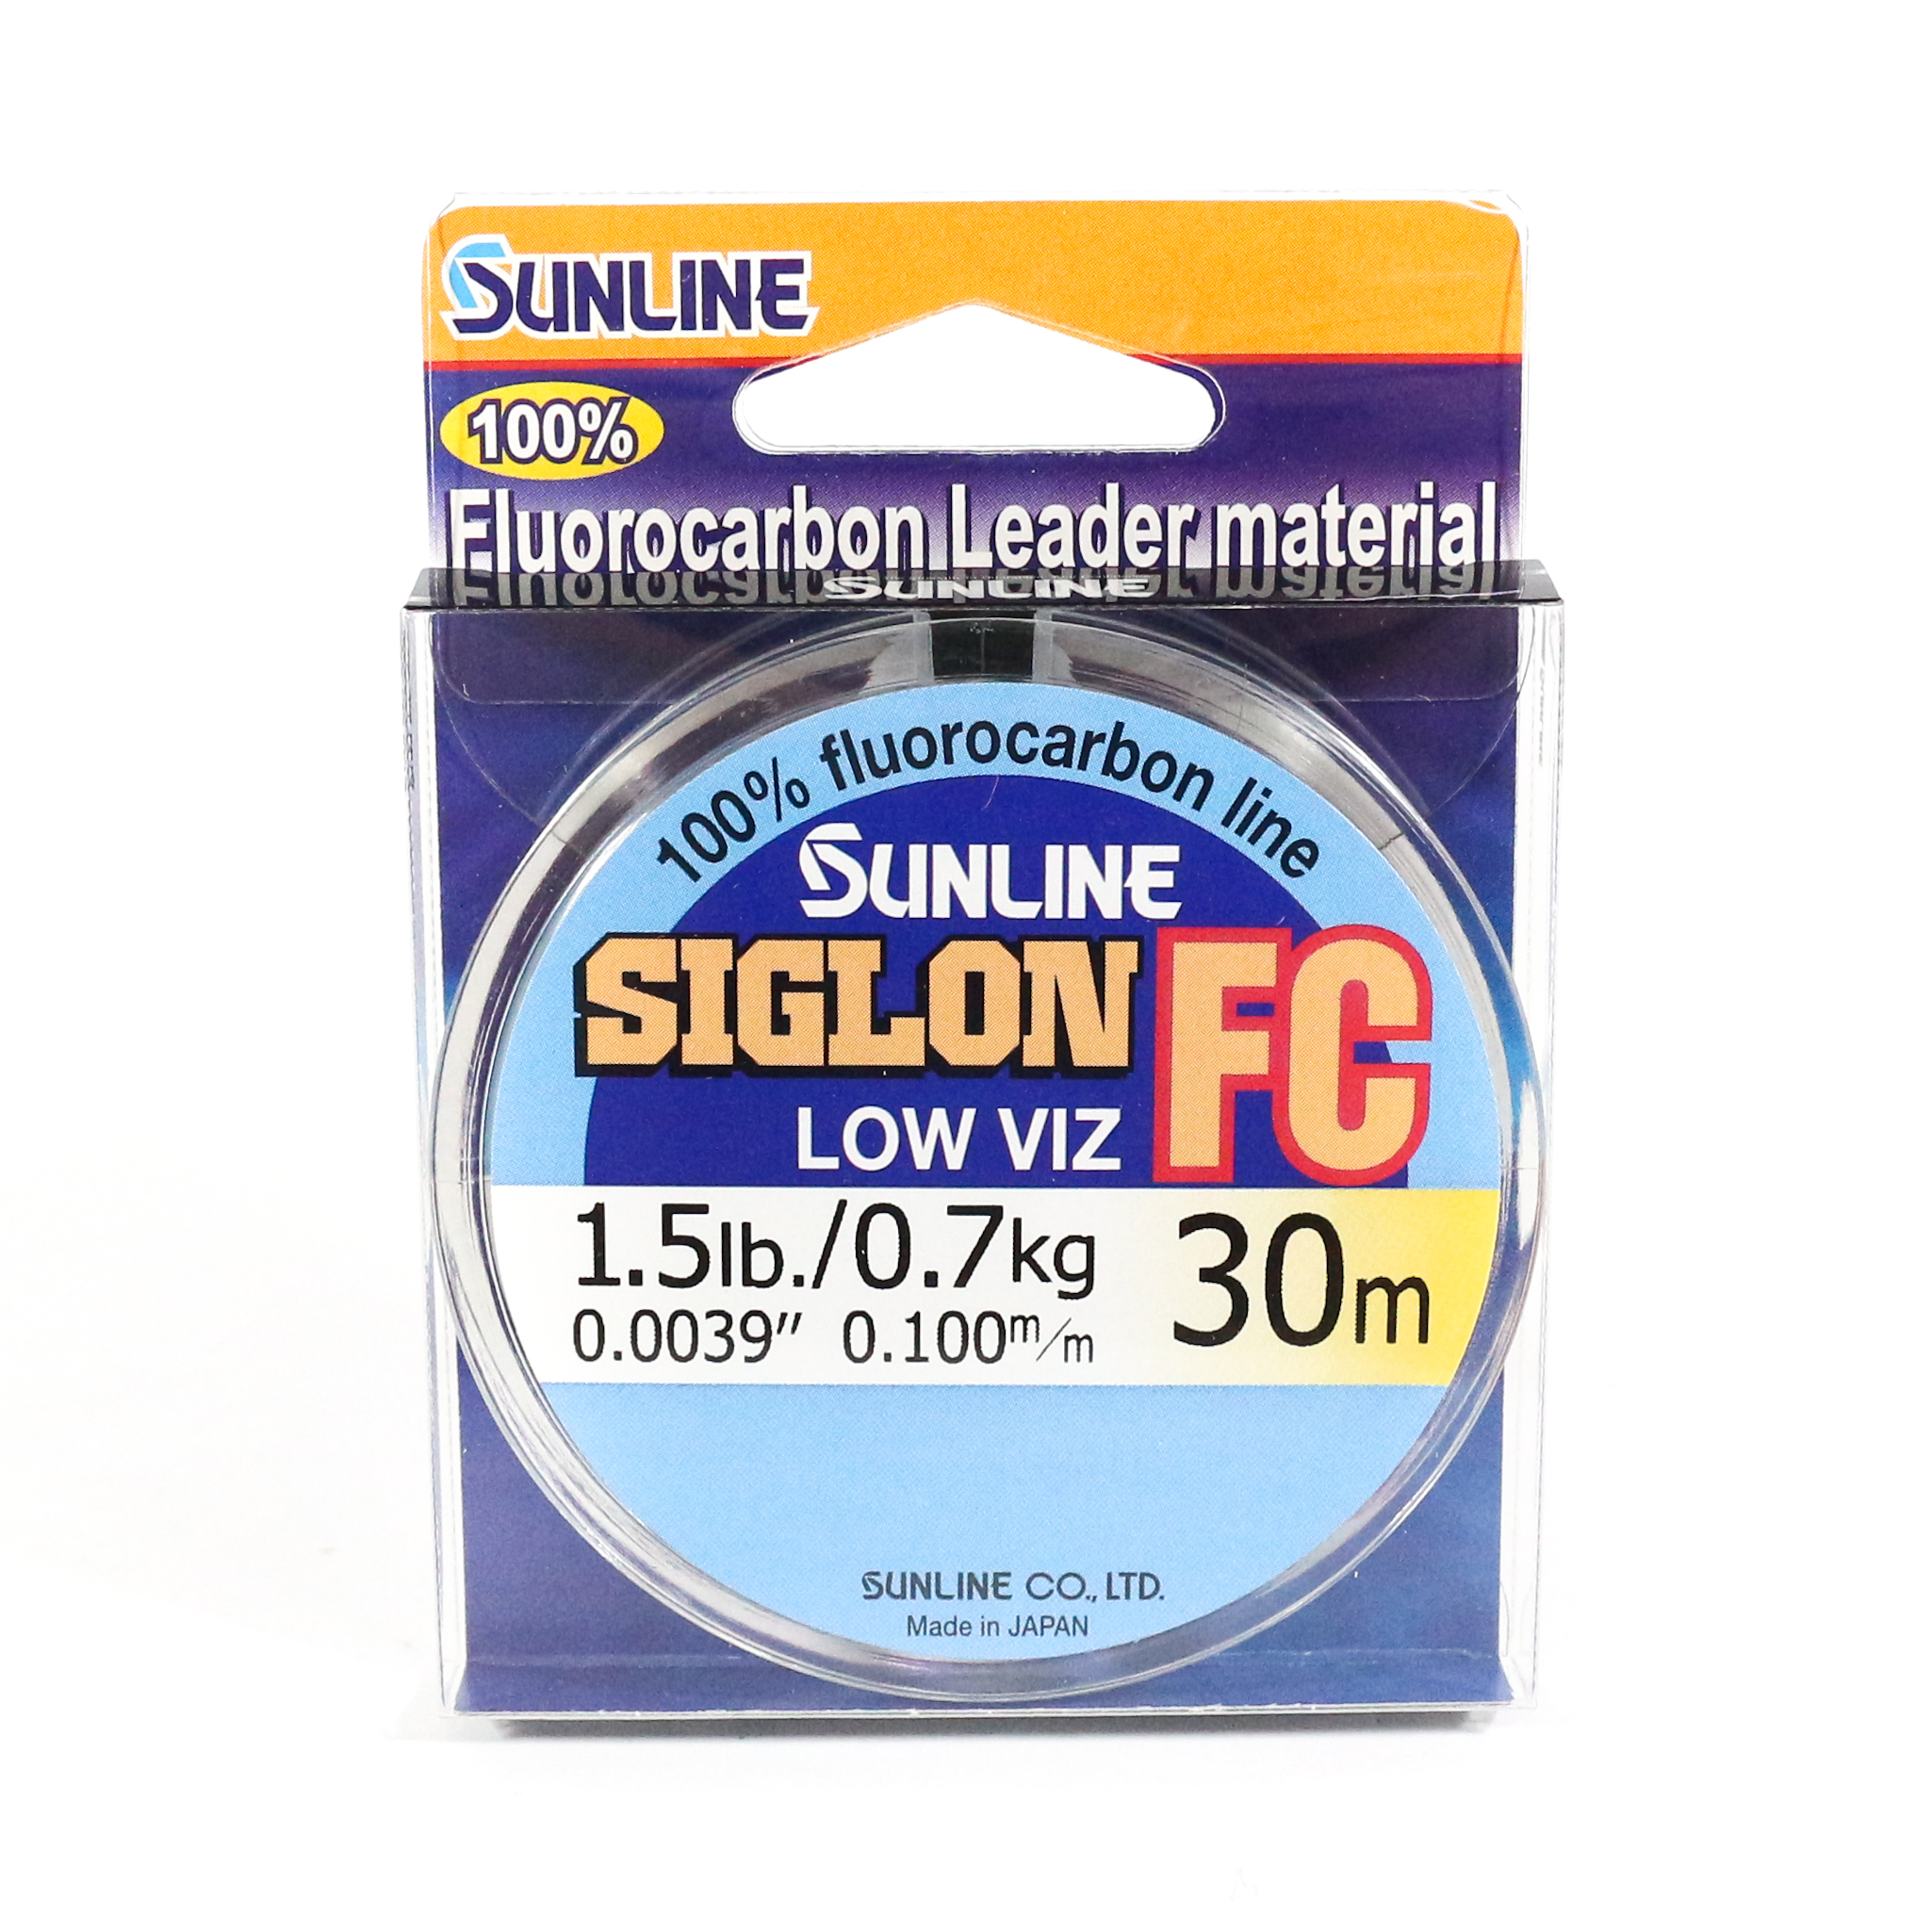 Sunline Siglon FC Fluorocarbon Line 30m 1.5lb Diameter 0.1 mm (5679)